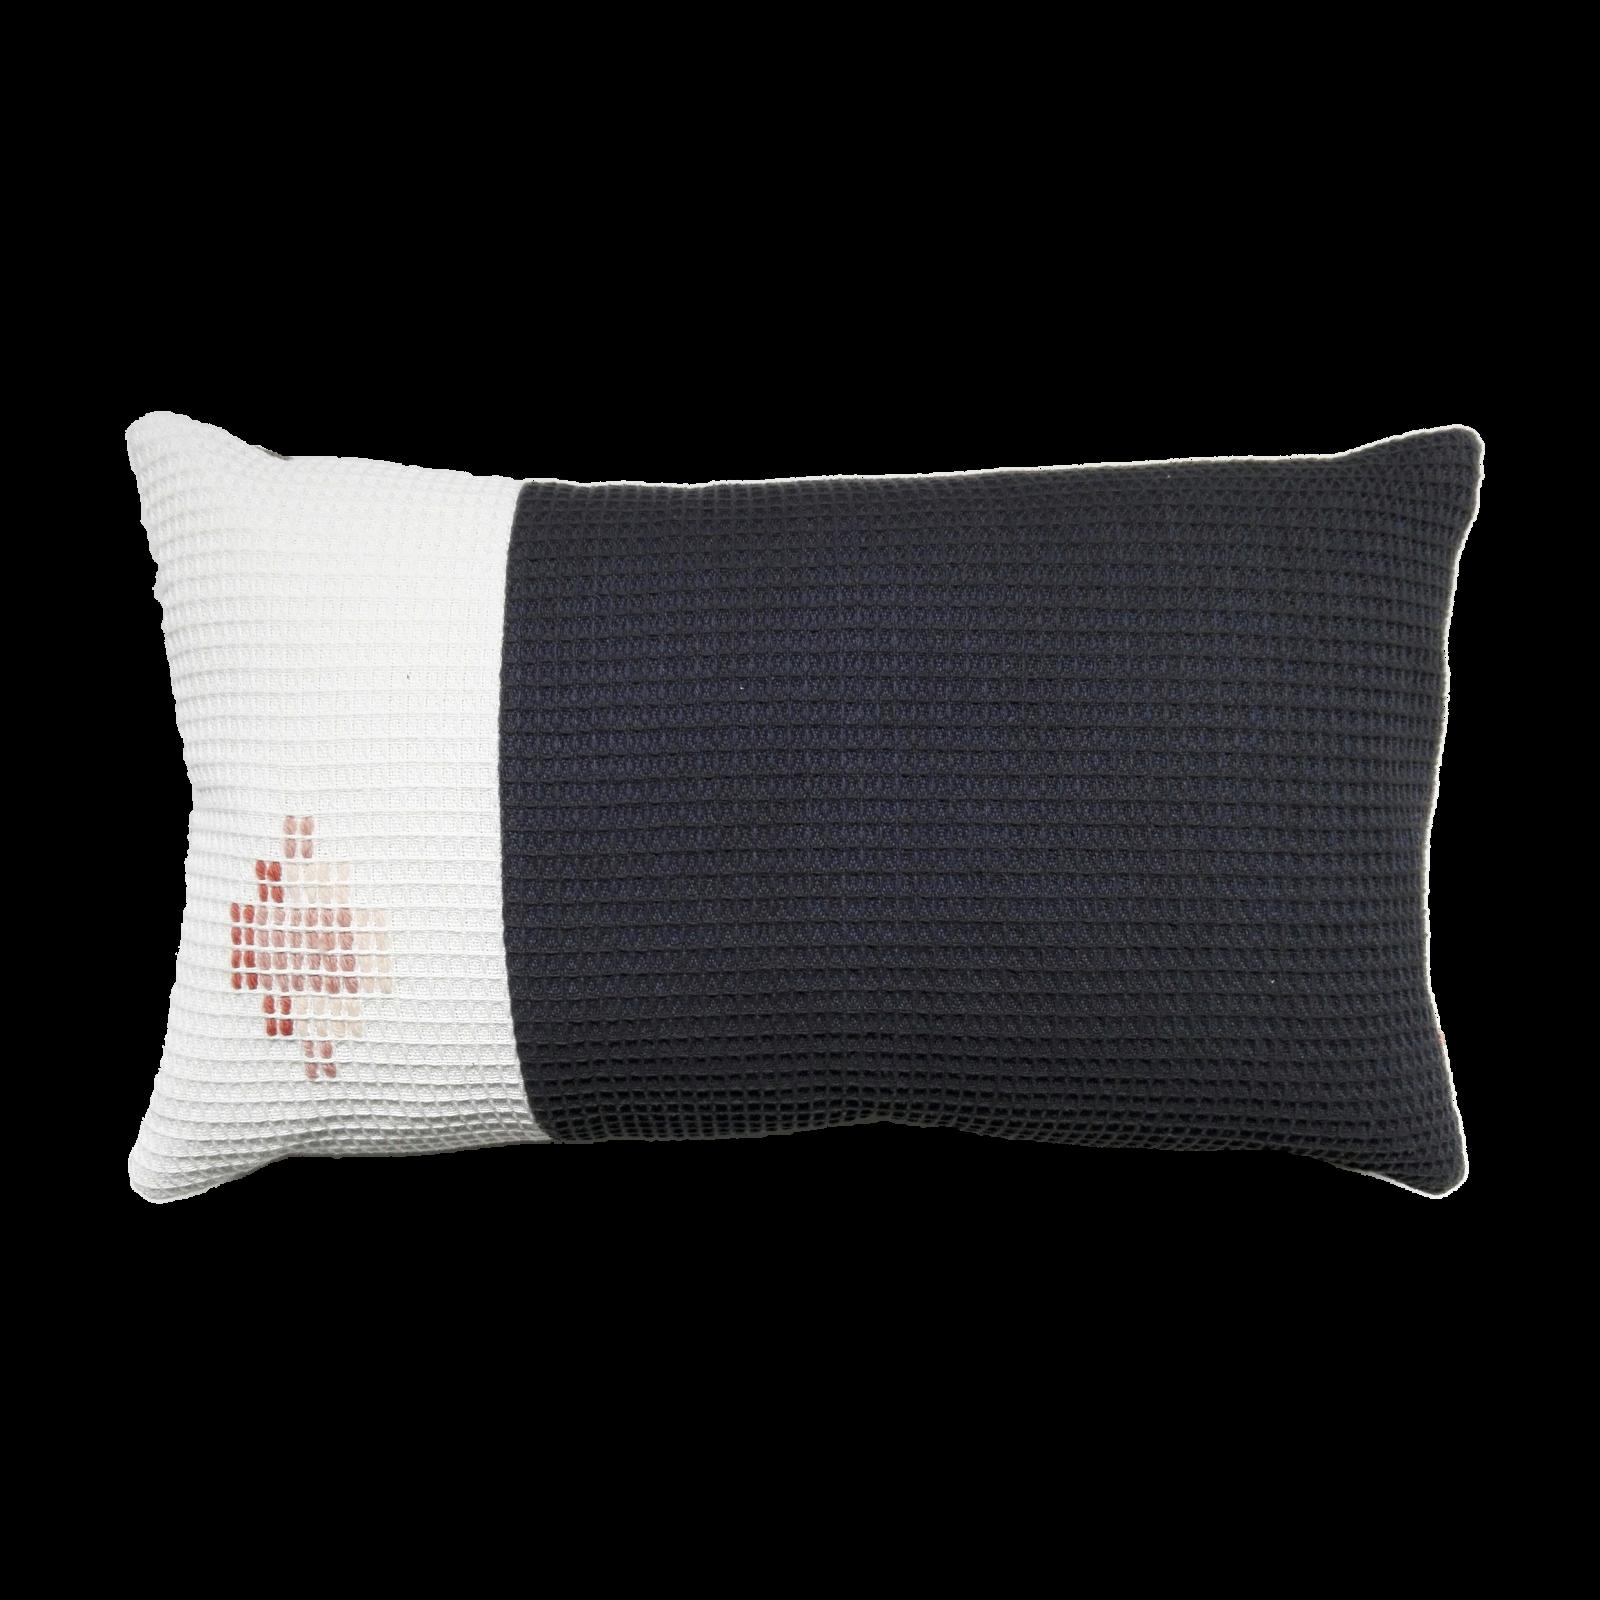 MASON organic cotton hand embroidered navy white rectangle